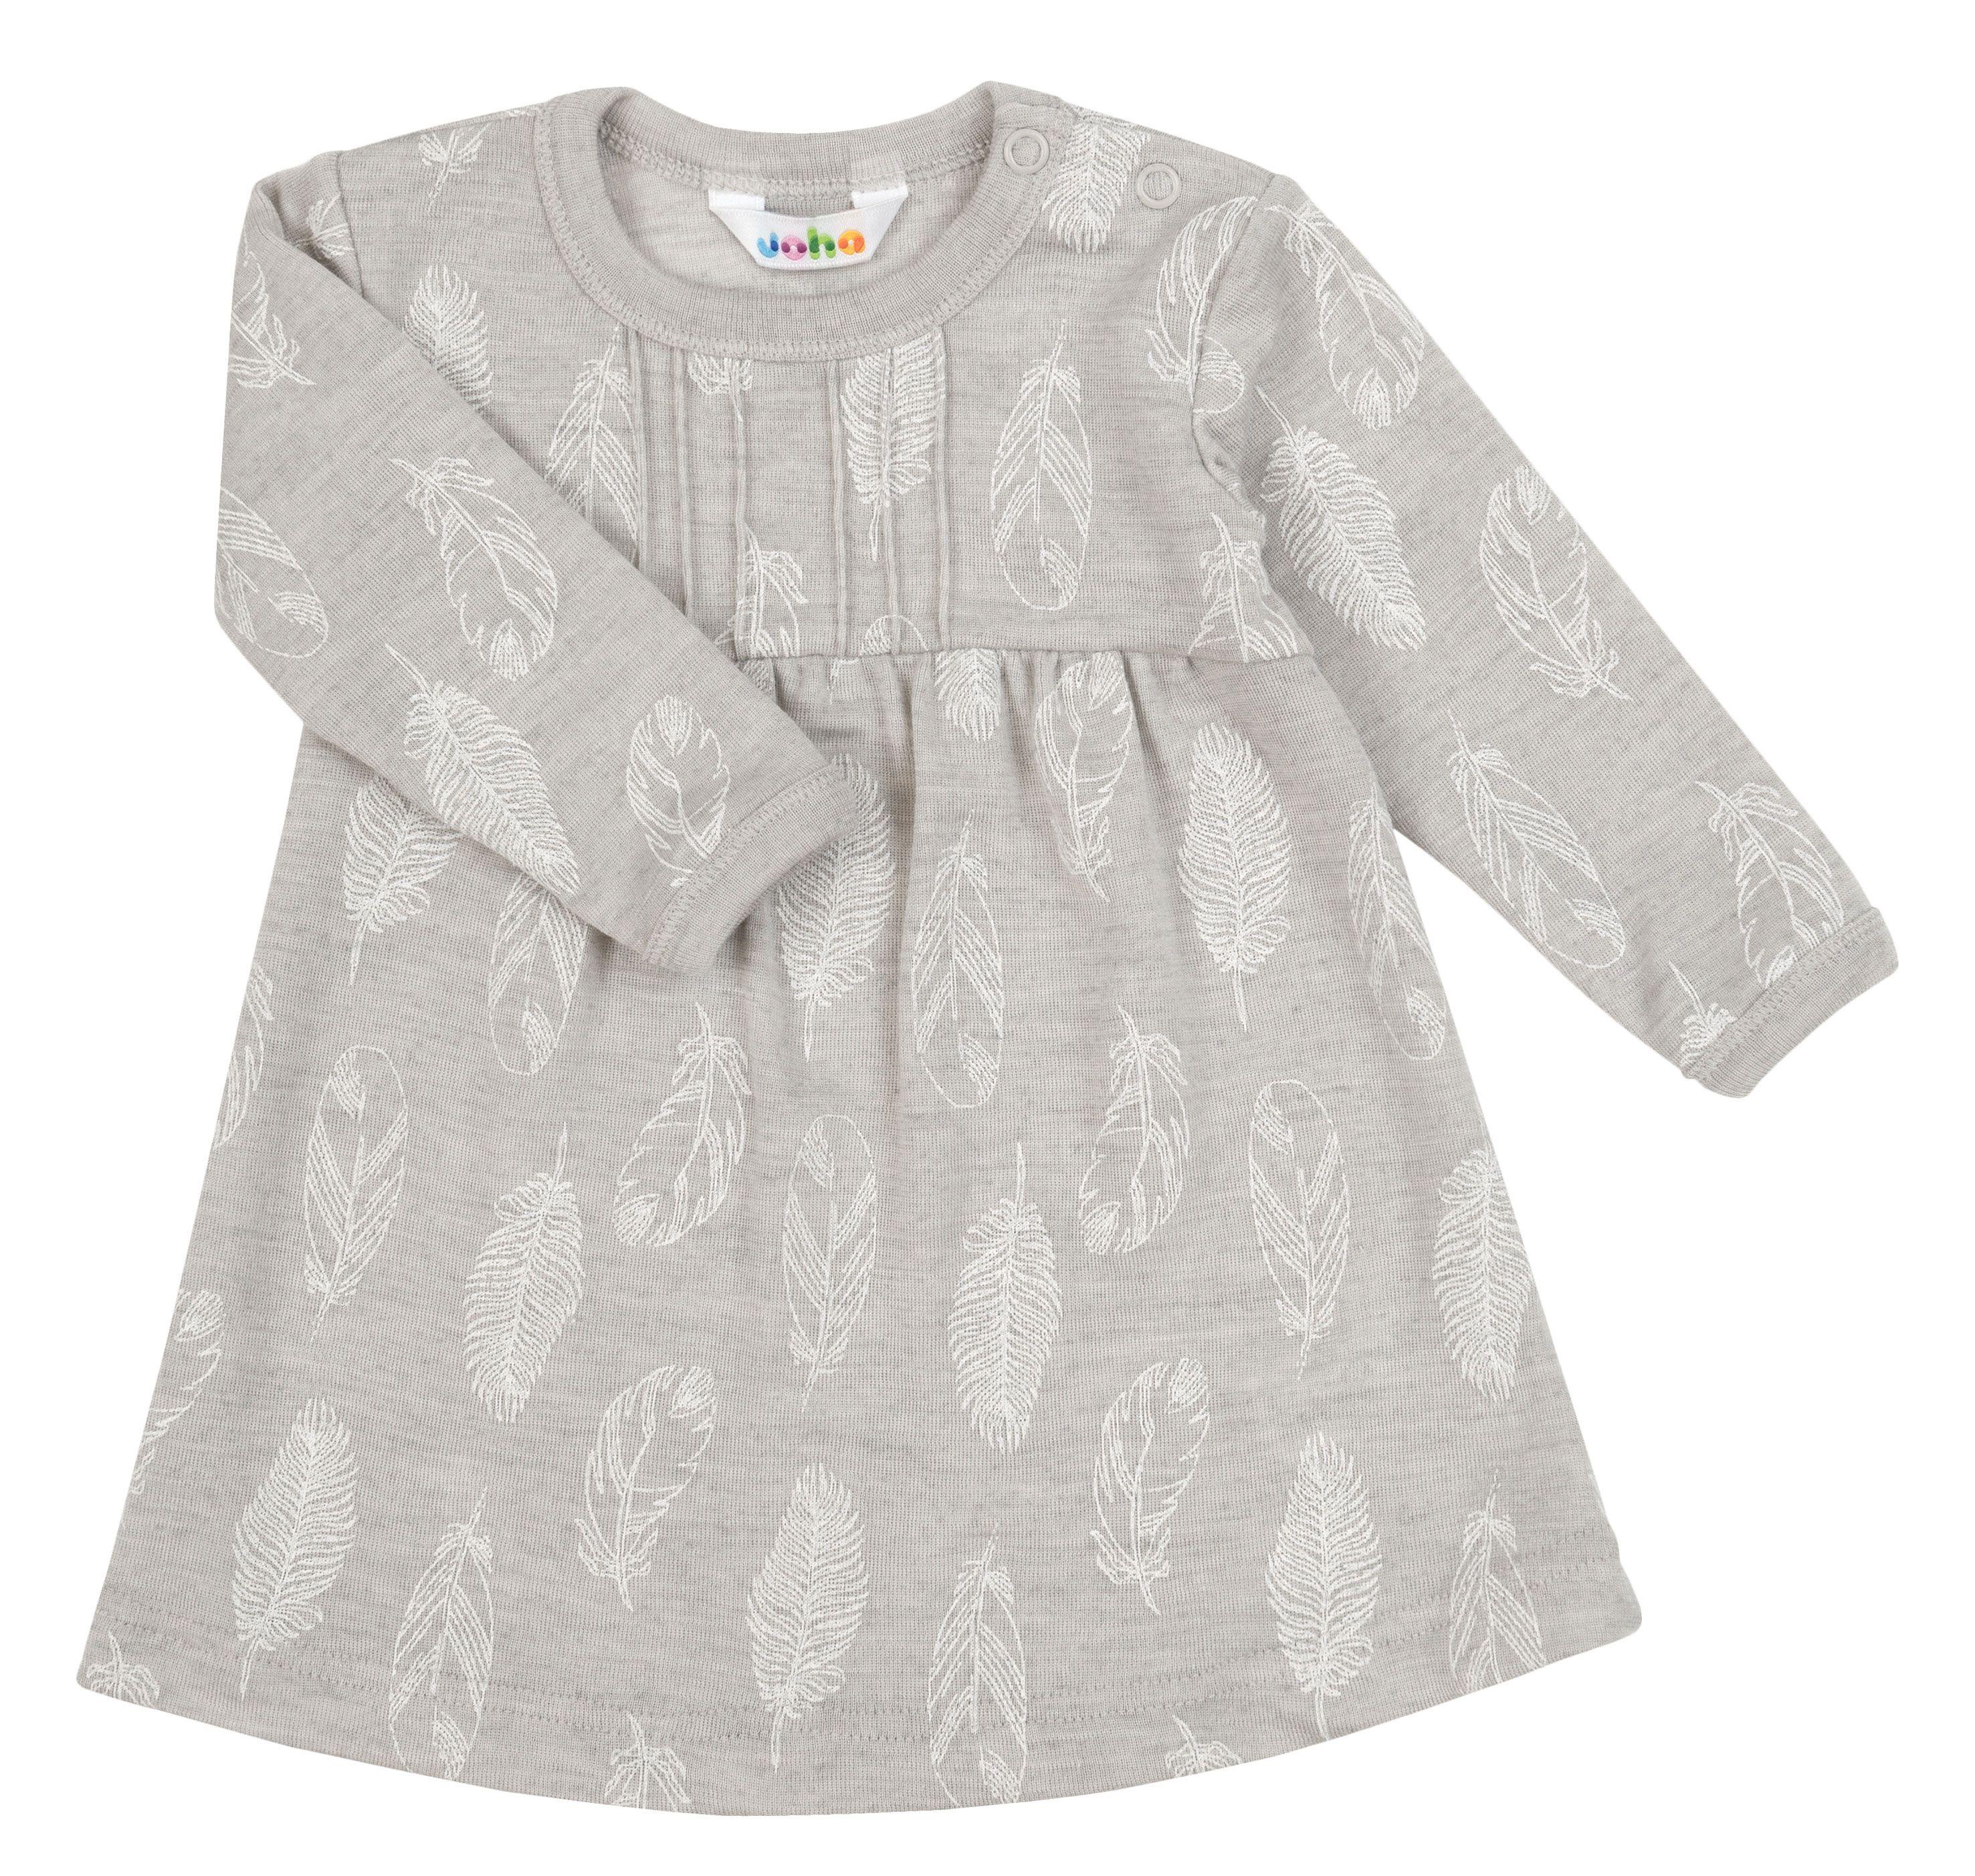 Image of Kjole fra Joha i uld-silke m. Grey Feathers (46121-195-3079)